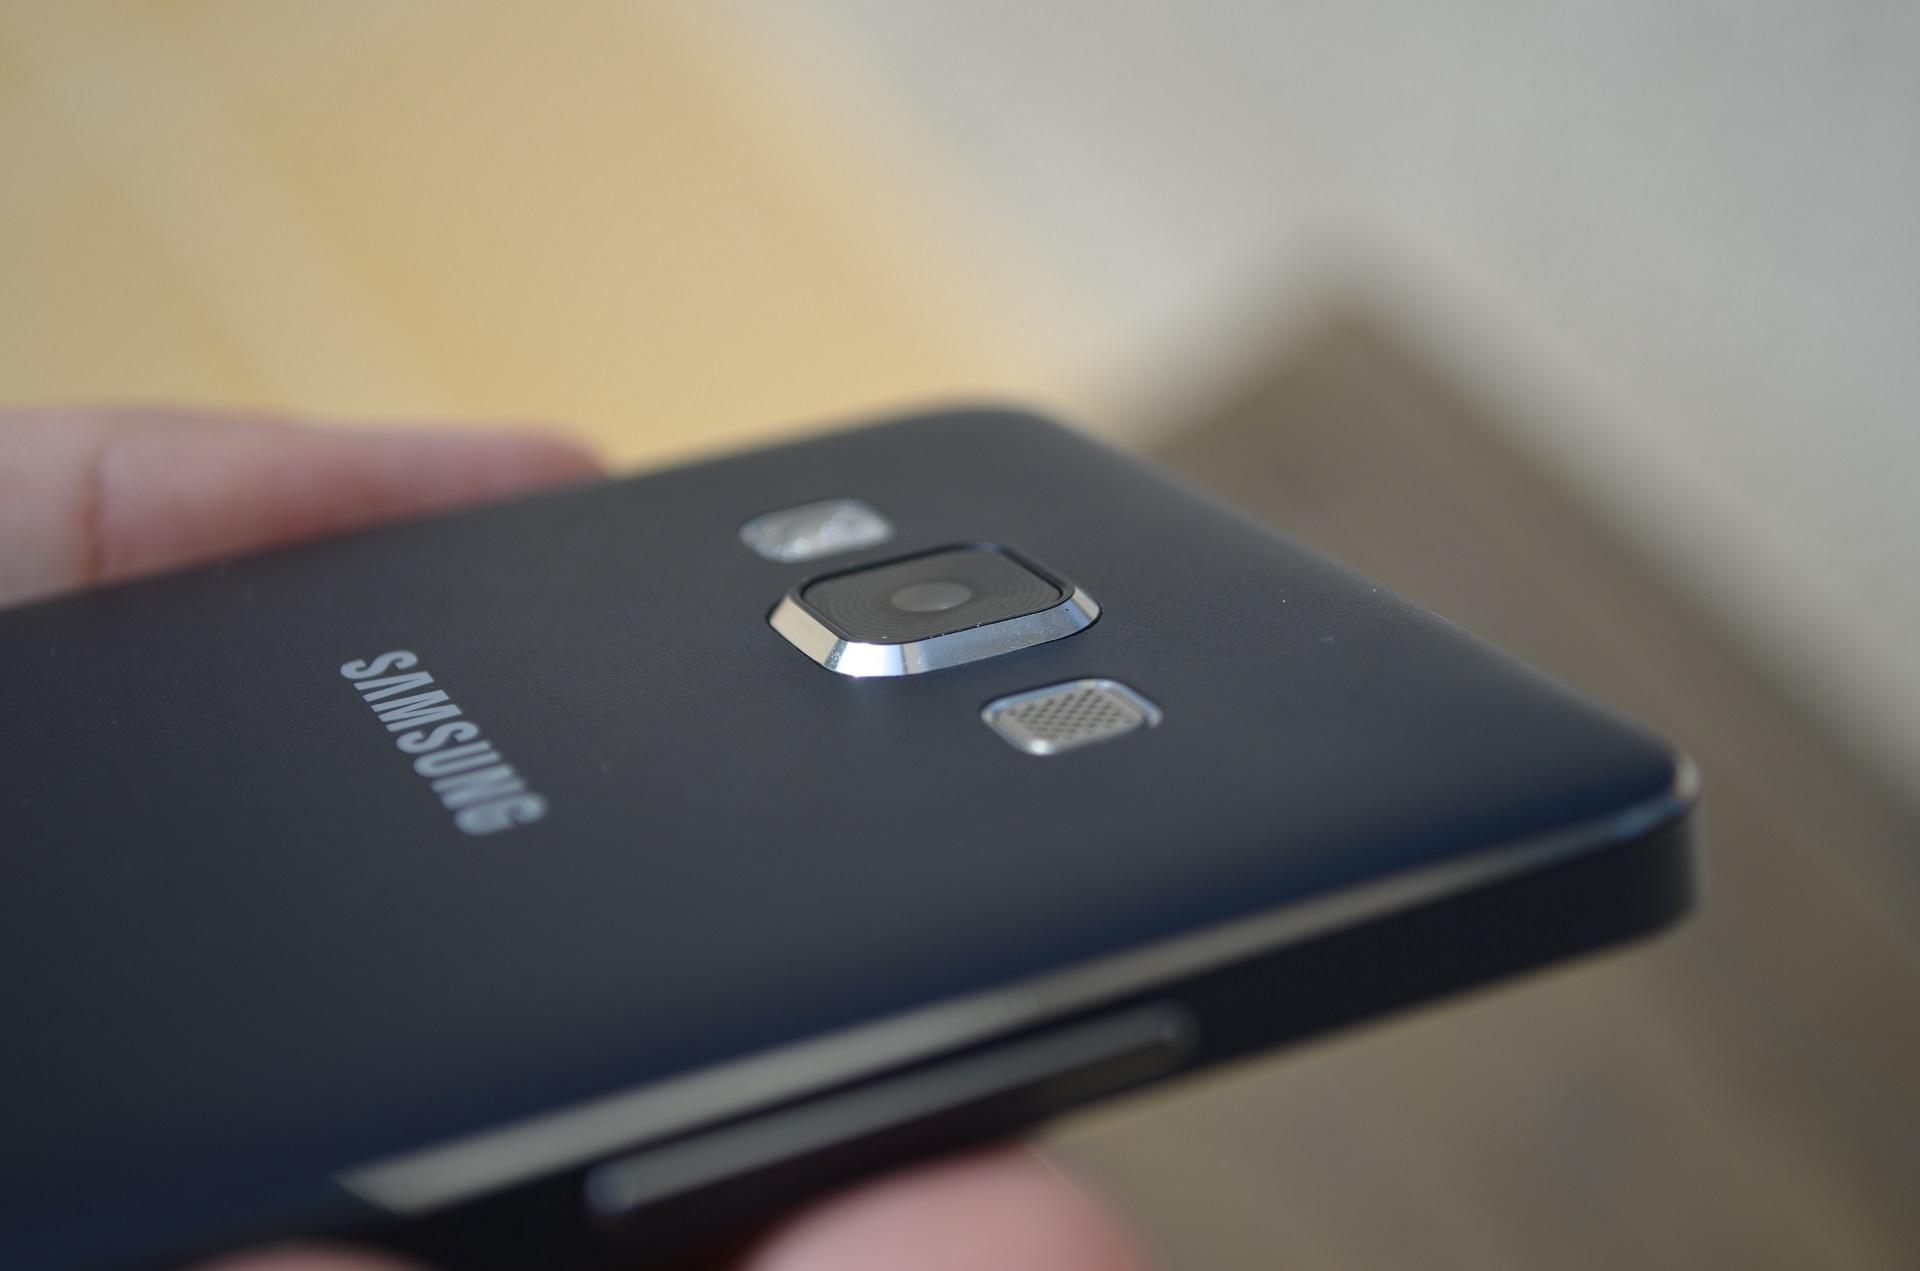 Samsung_A5 (7)